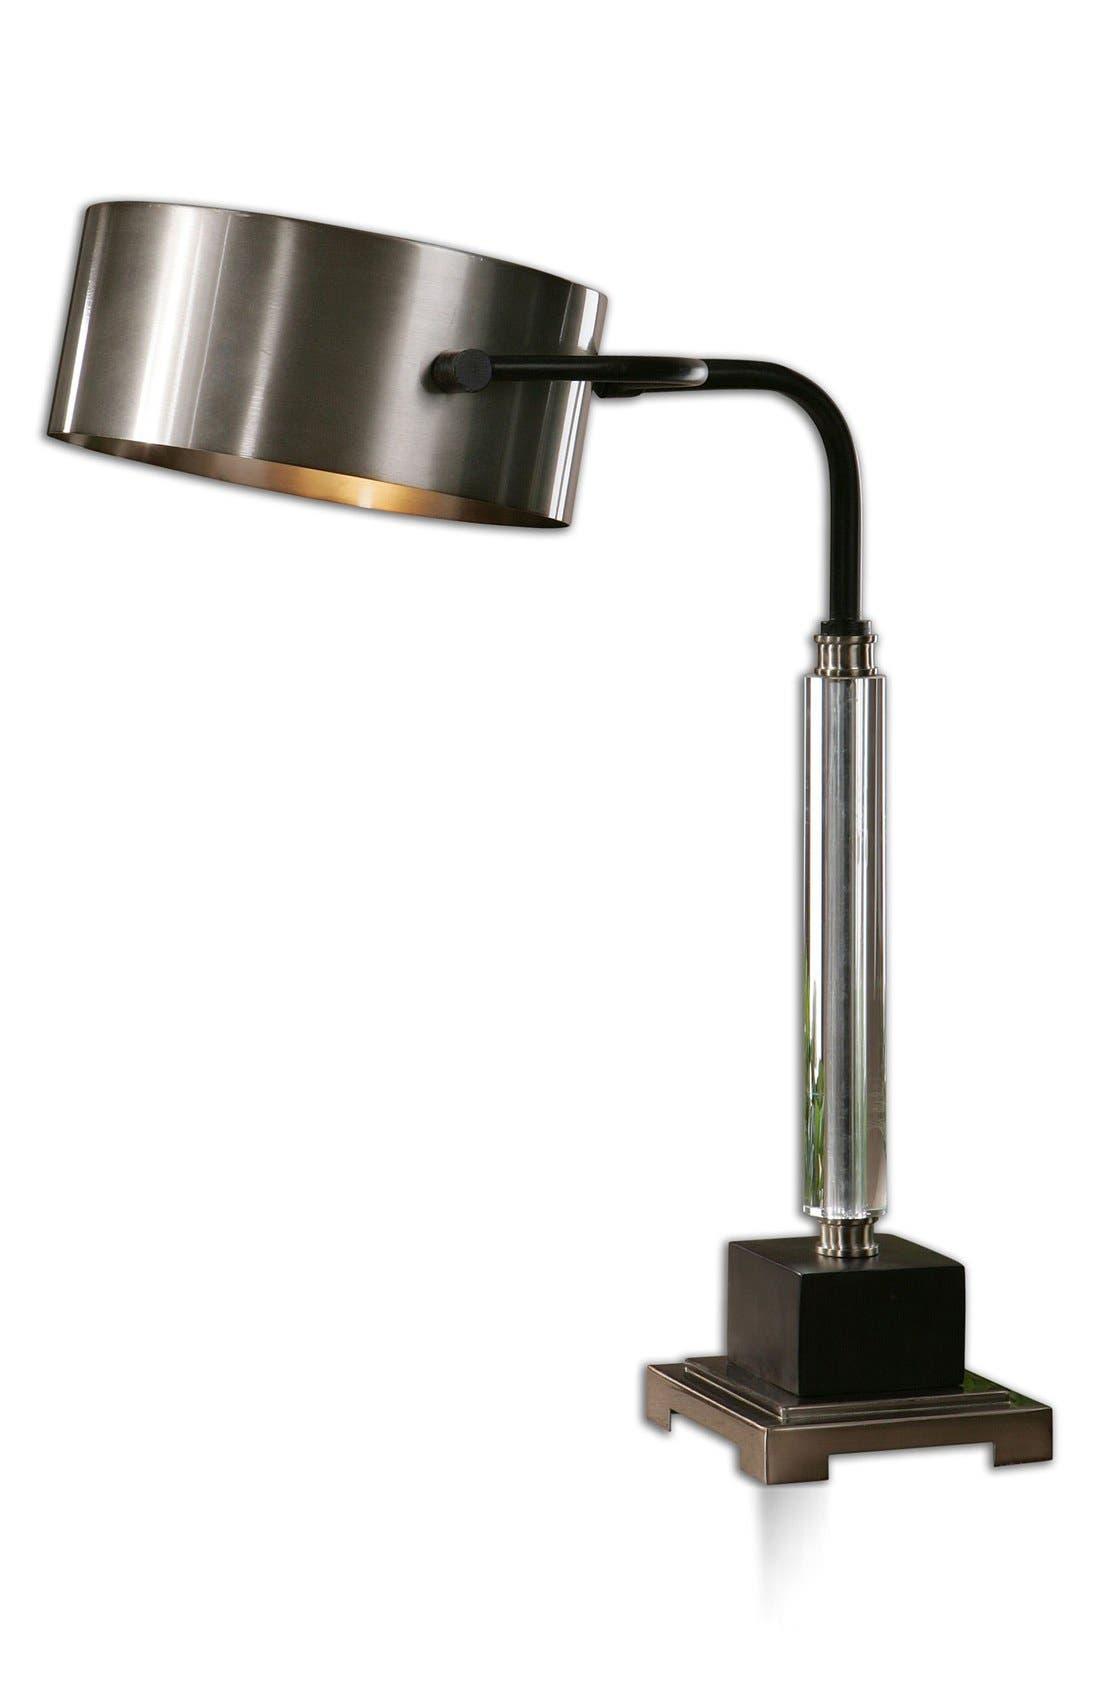 'Belding' Desk Lamp,                             Main thumbnail 1, color,                             020